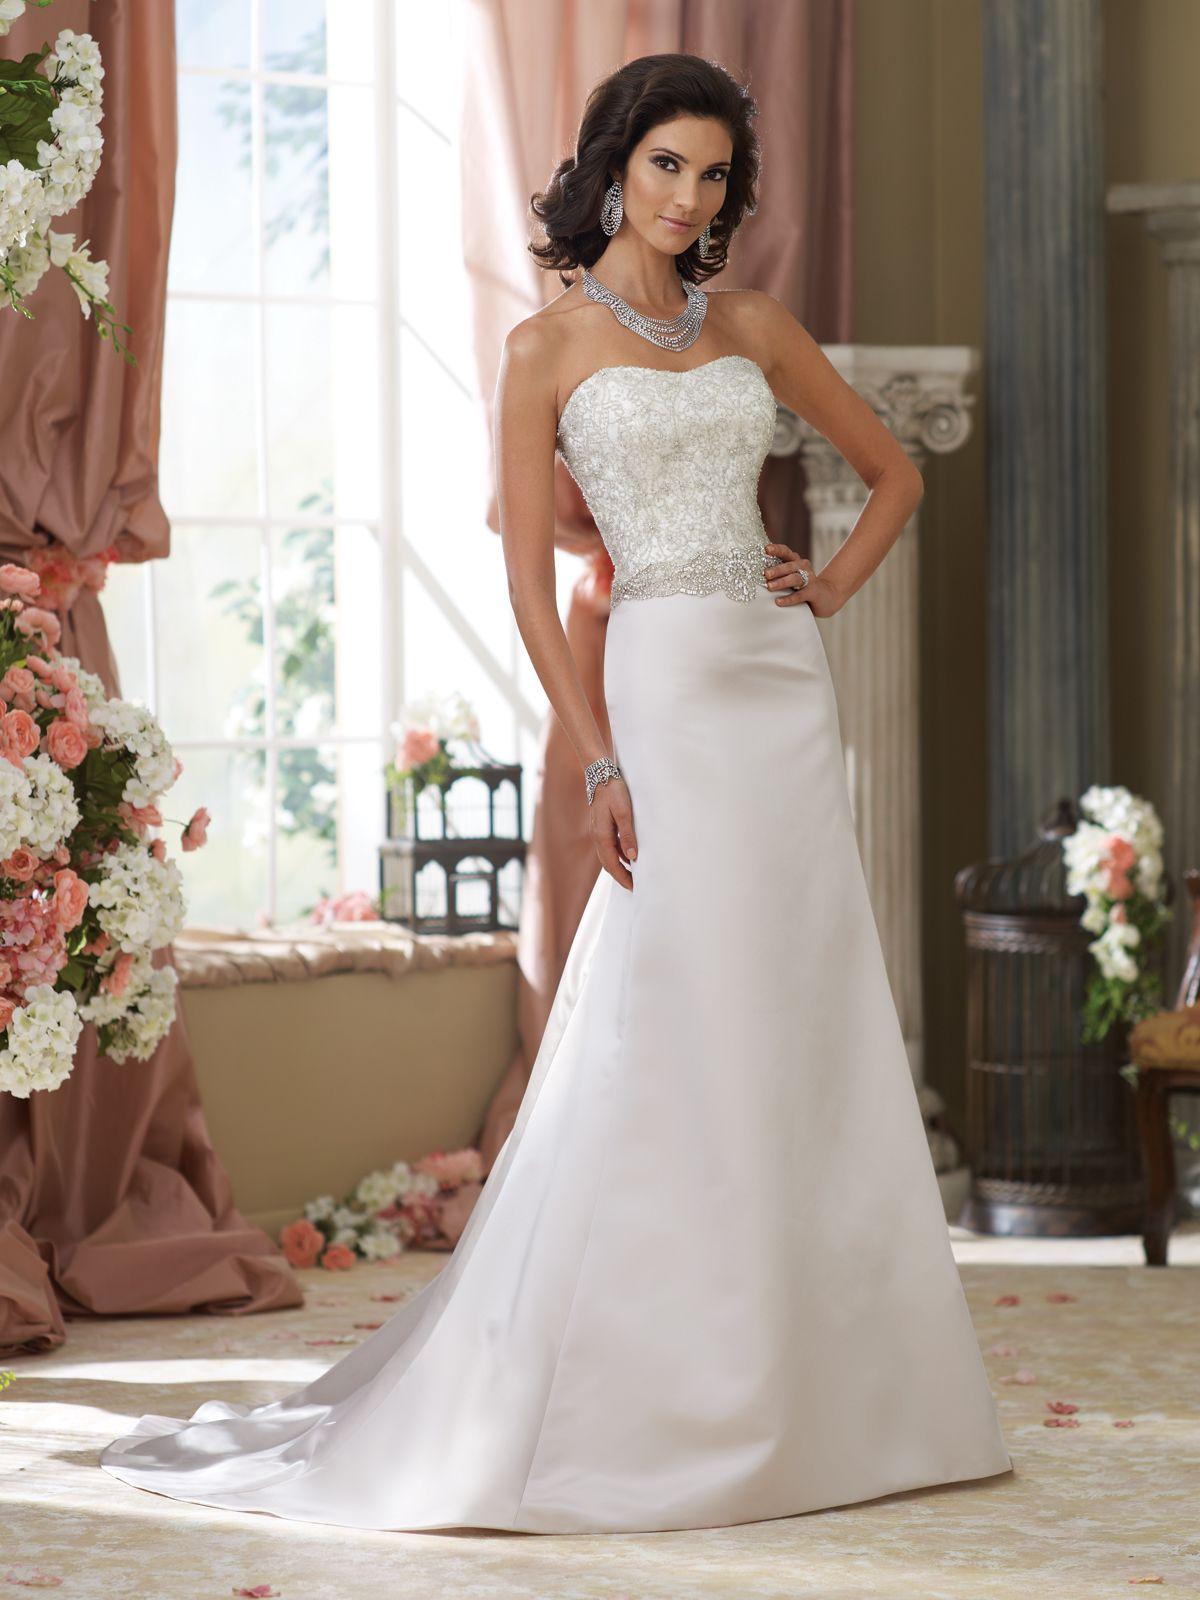 Wedding Dresses 2014 Collection Strapless handbeaded